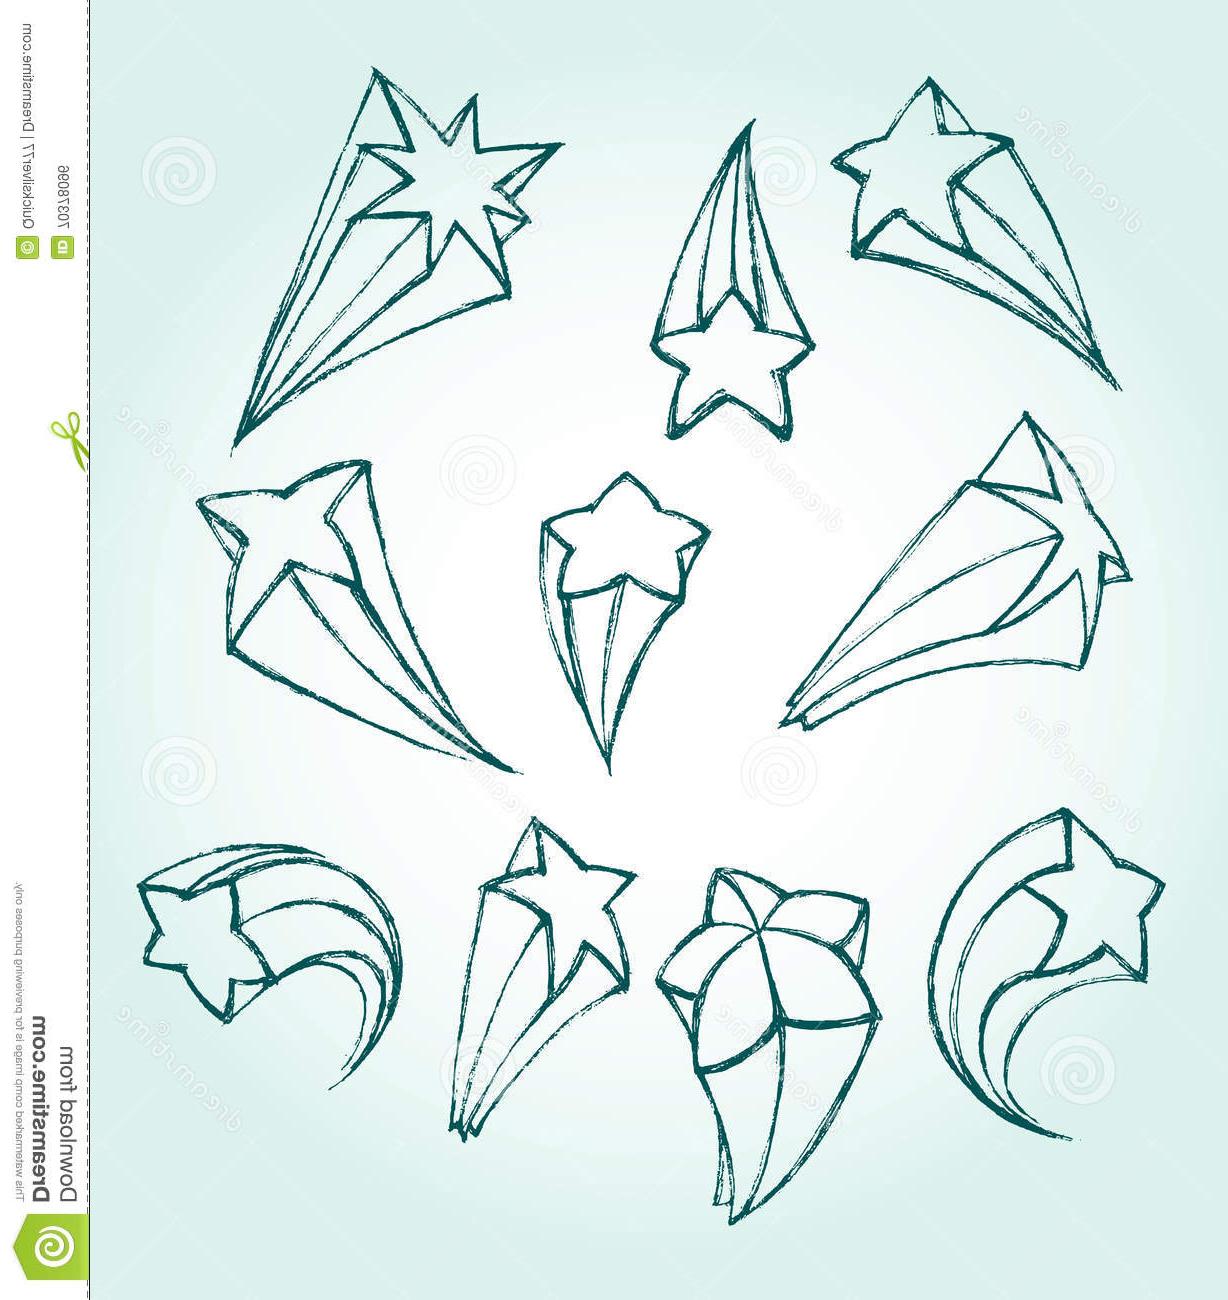 1228x1300 Cool Shooting Star Drawings 3d 3d Star Sketch Stock Vector